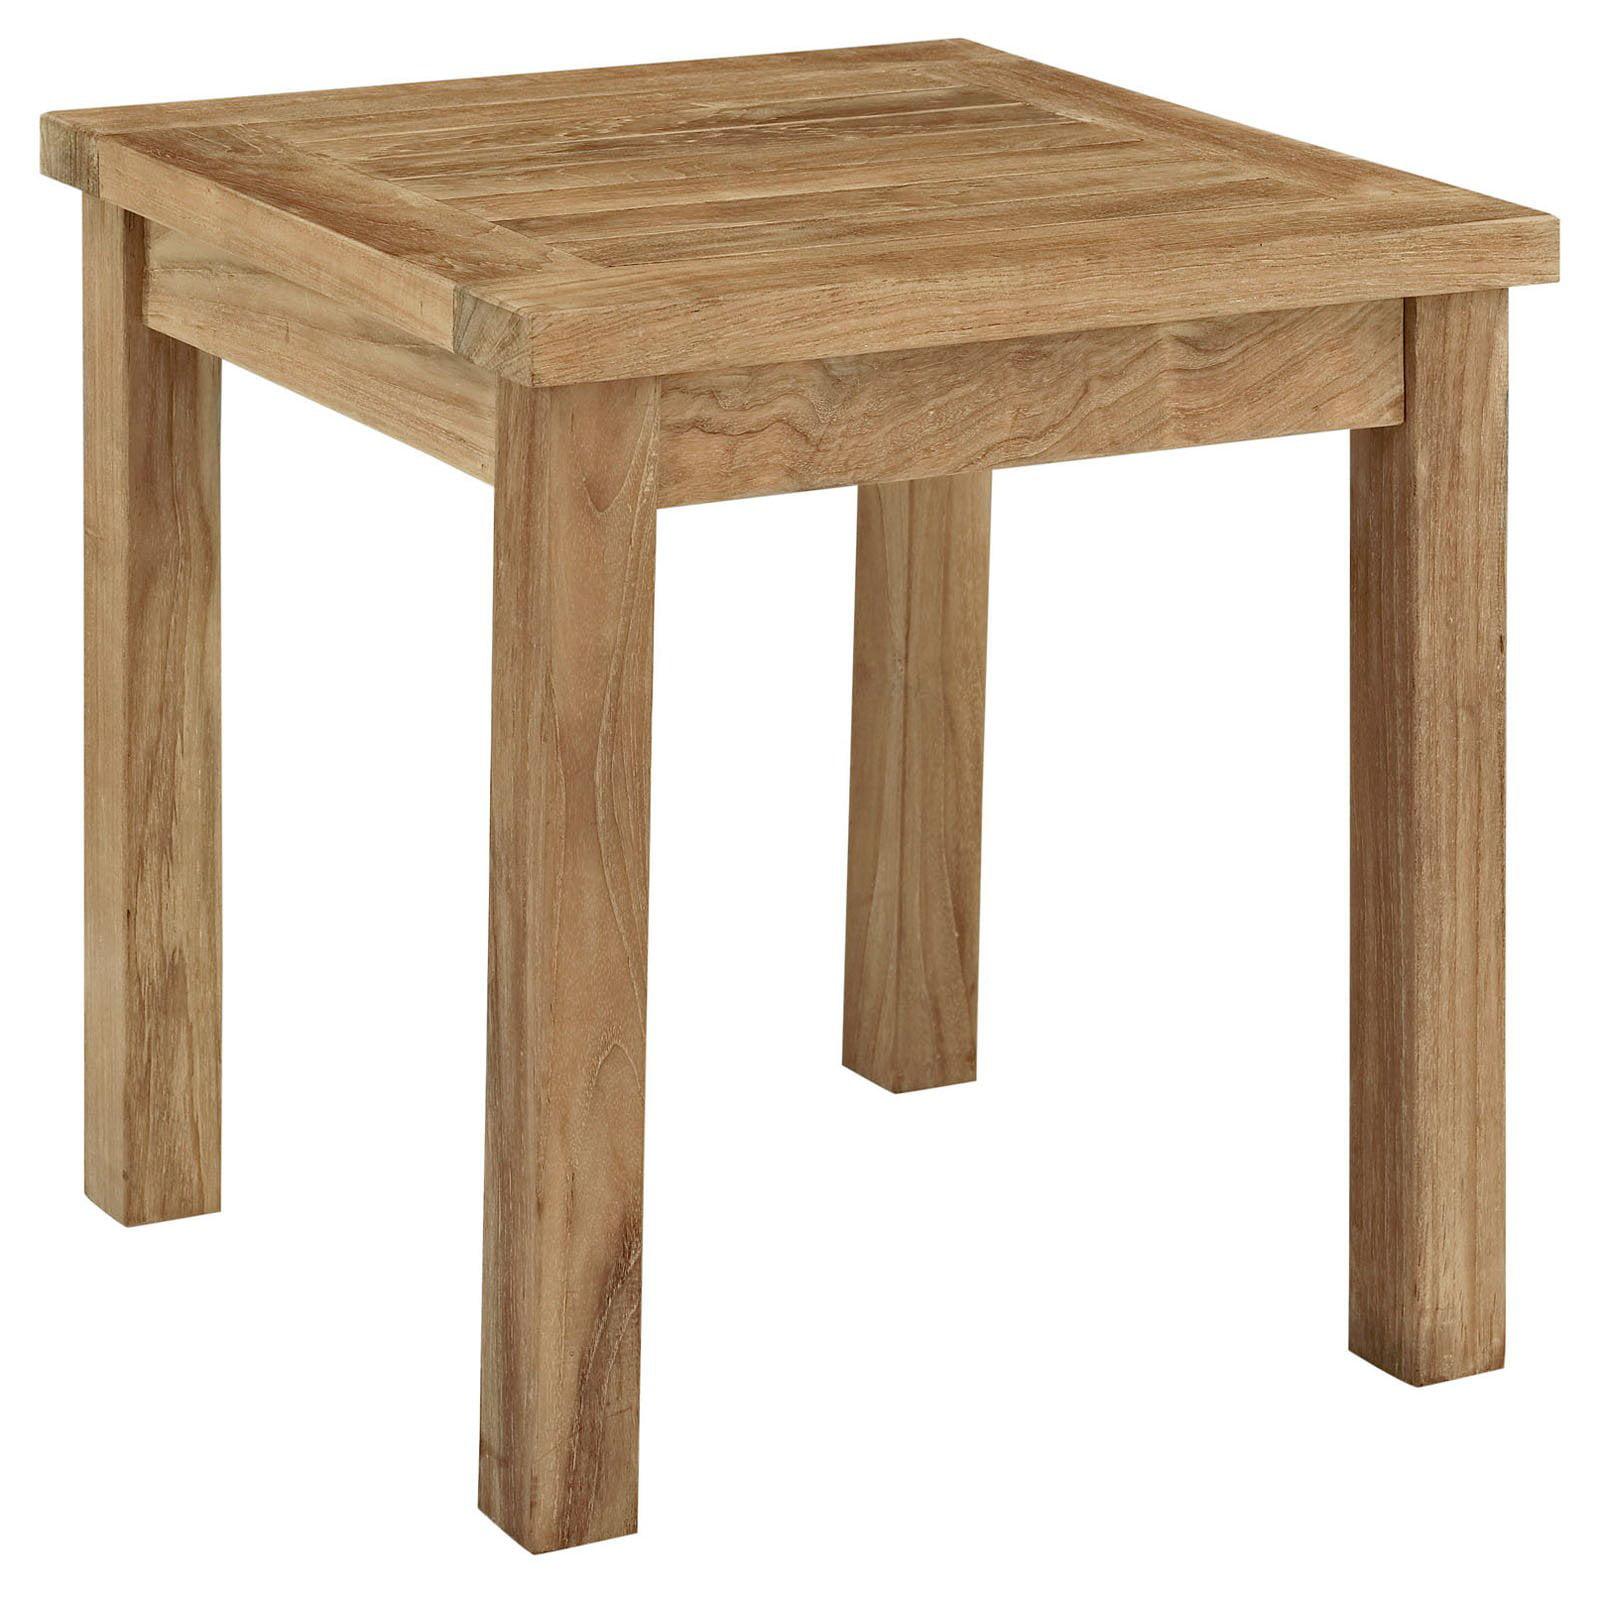 Modway Marina Outdoor Patio Teak Side Table, Natural